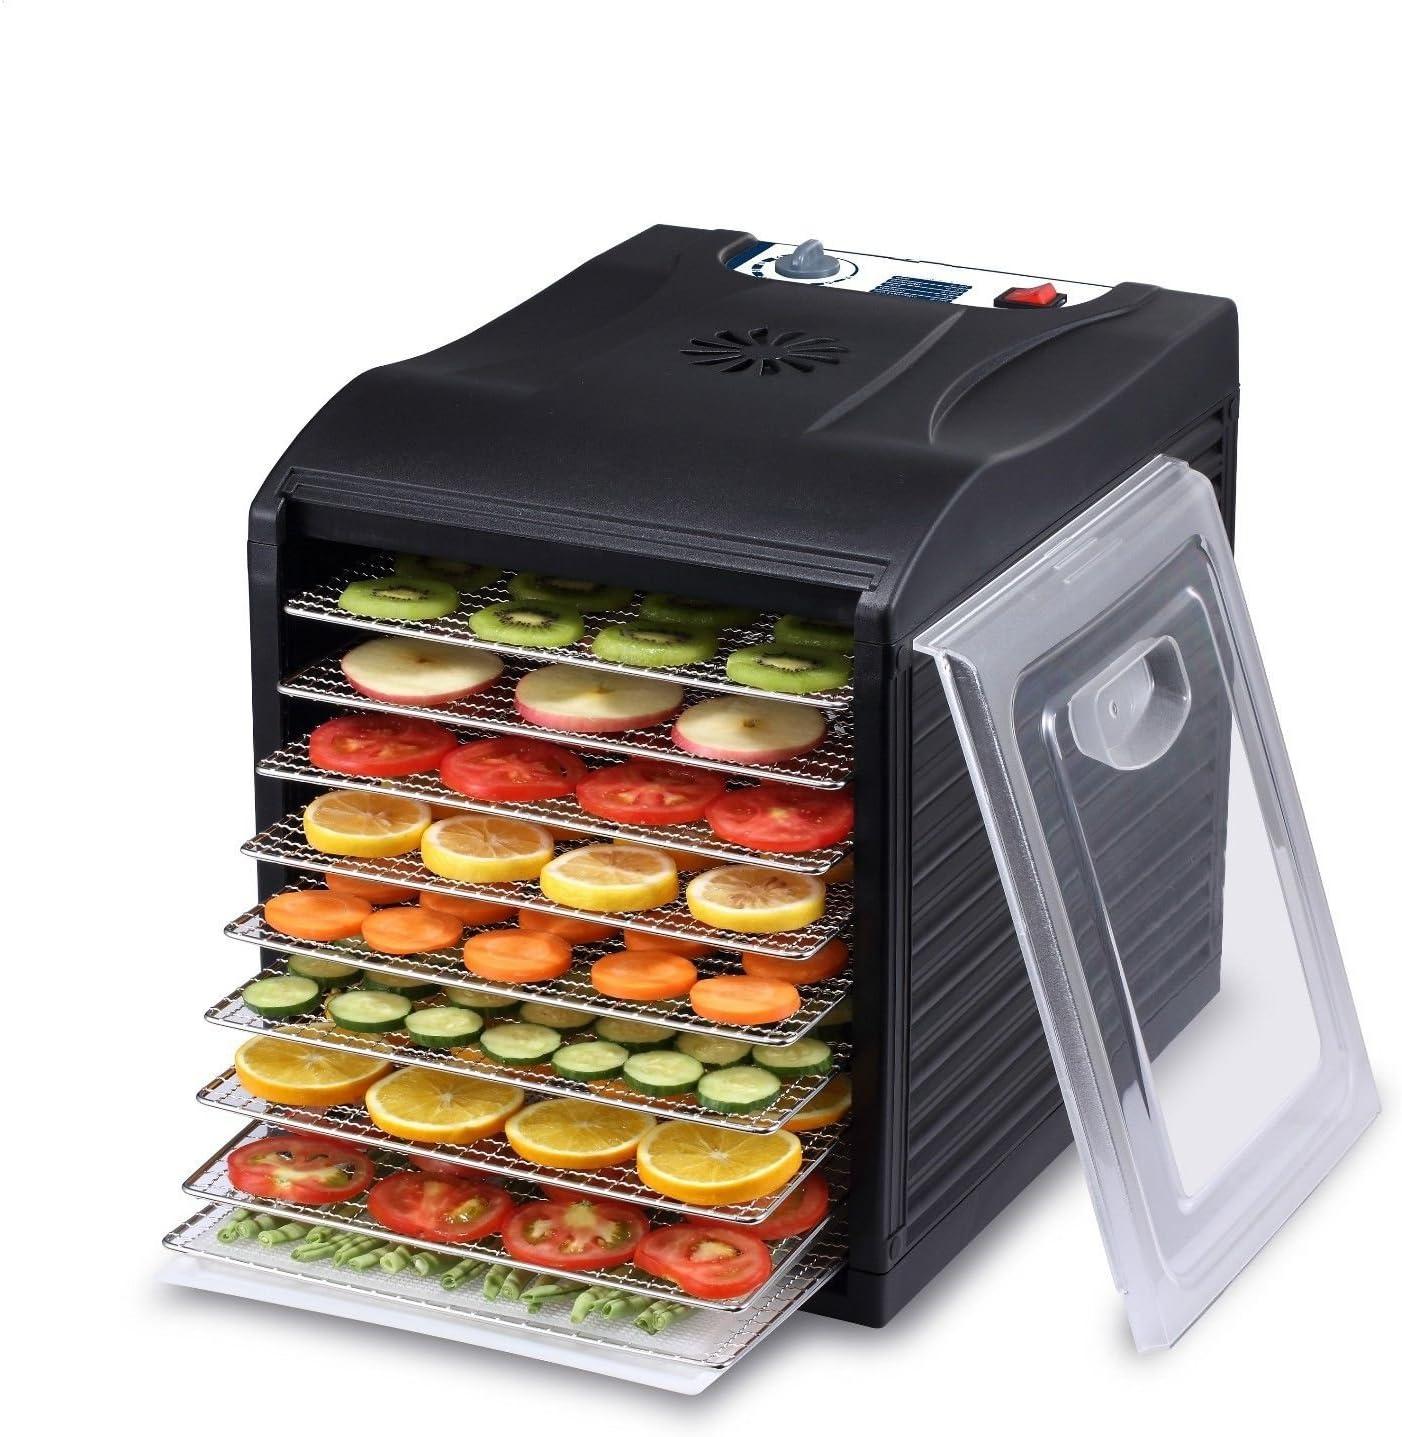 813nW OcSZL. AC SL1500 5 Best Food Dehydrator UK (Beef Jerky, Fruits, Herbs)